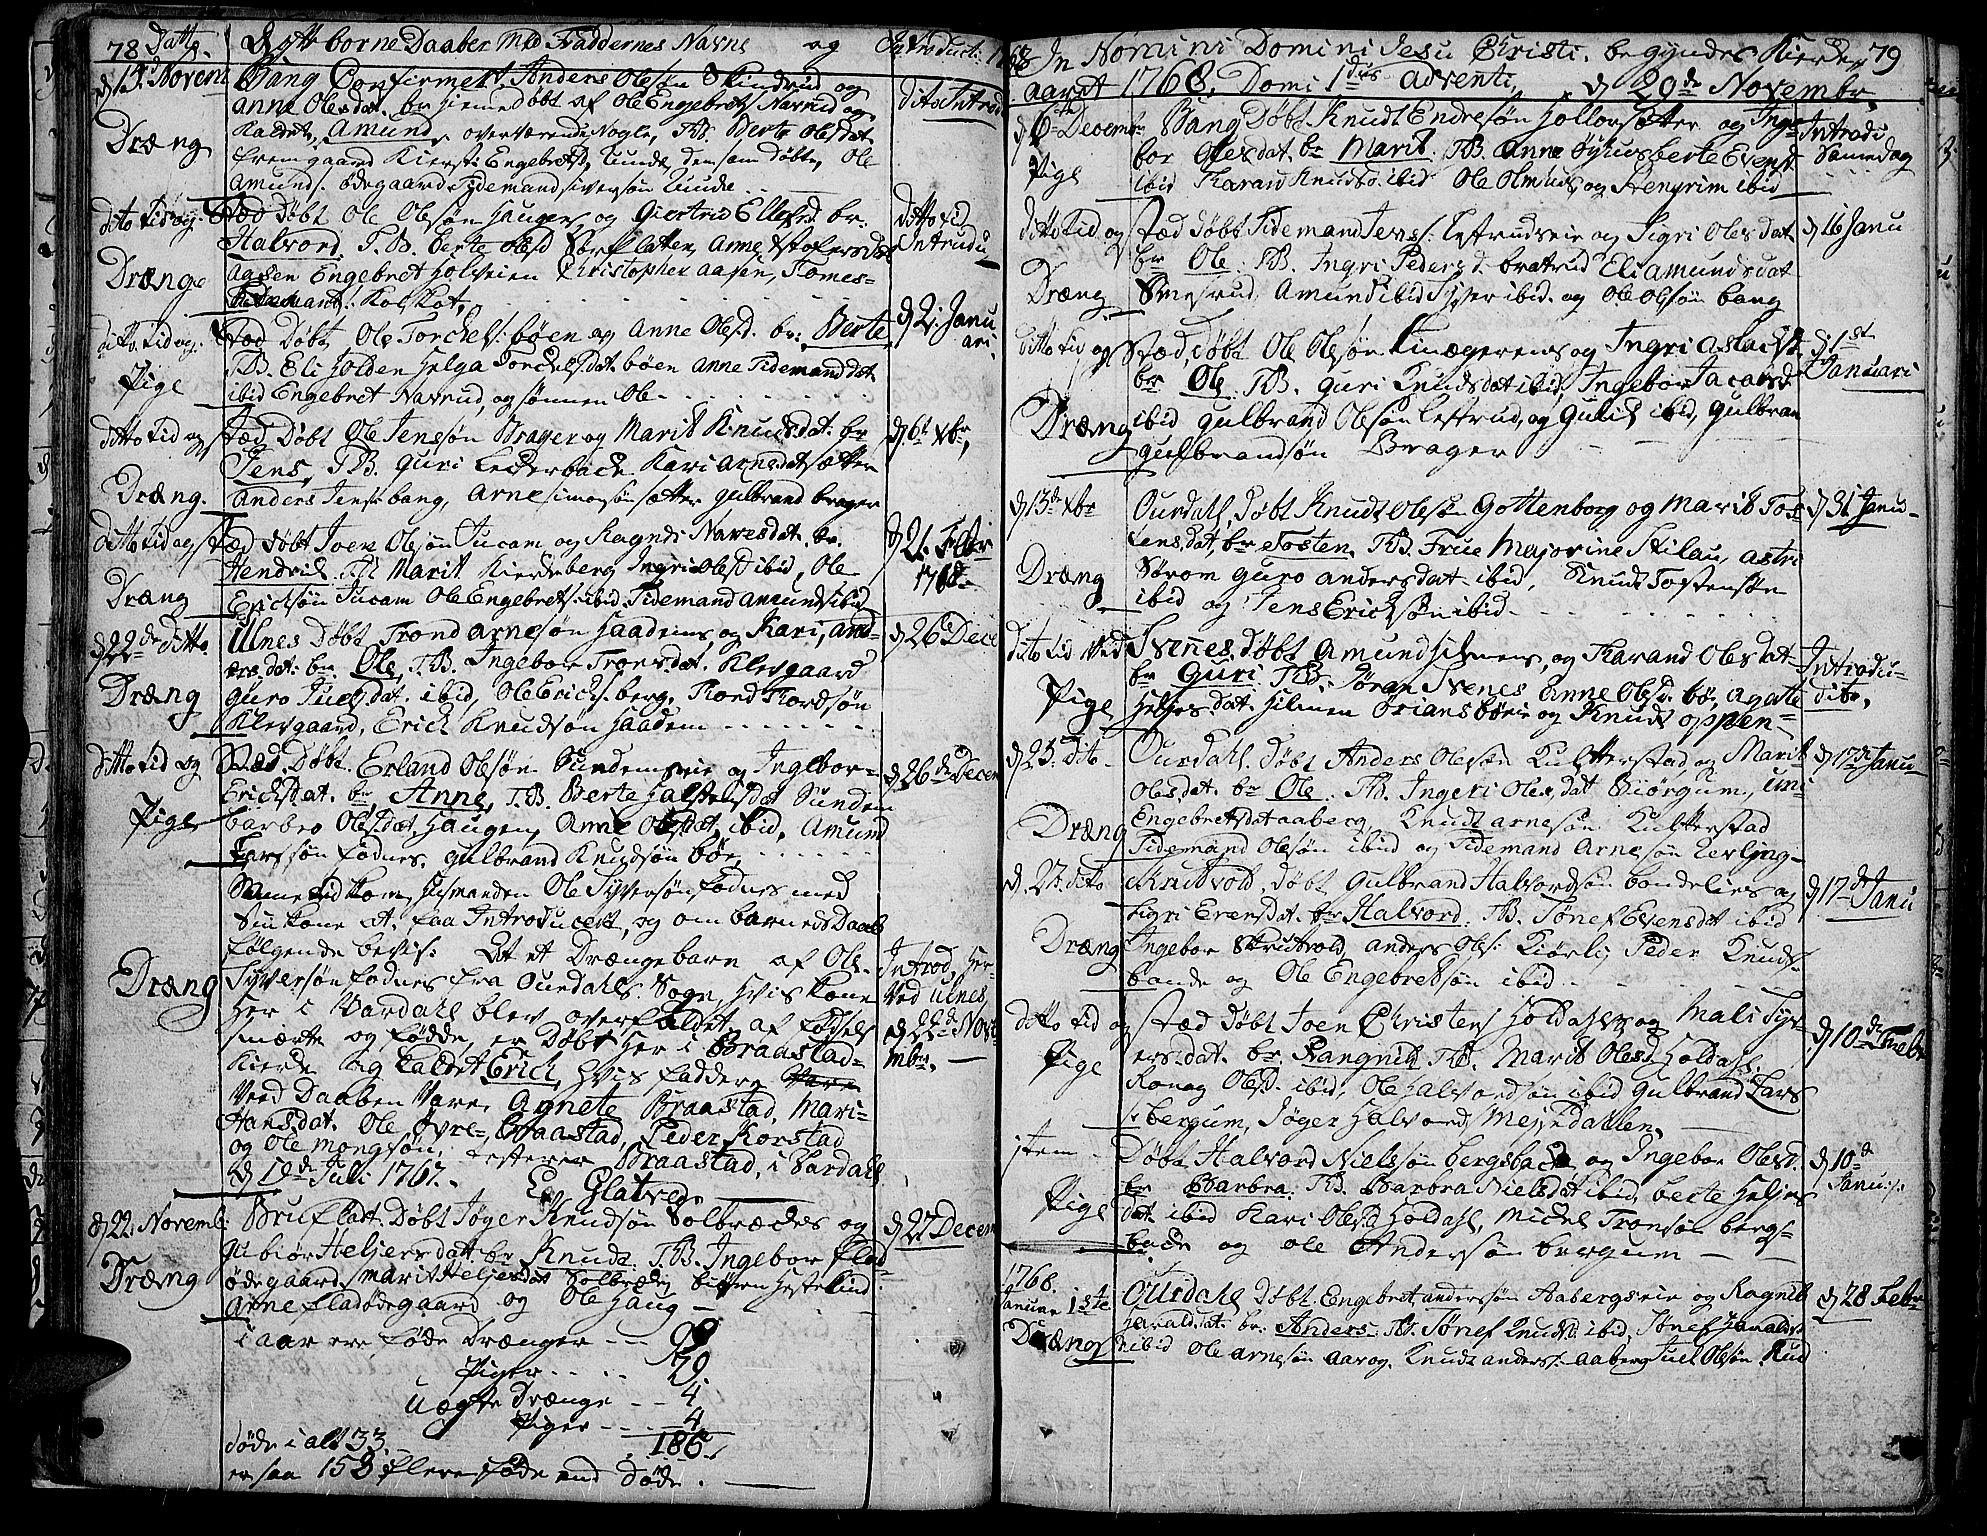 SAH, Aurdal prestekontor, Ministerialbok nr. 5, 1763-1781, s. 78-79